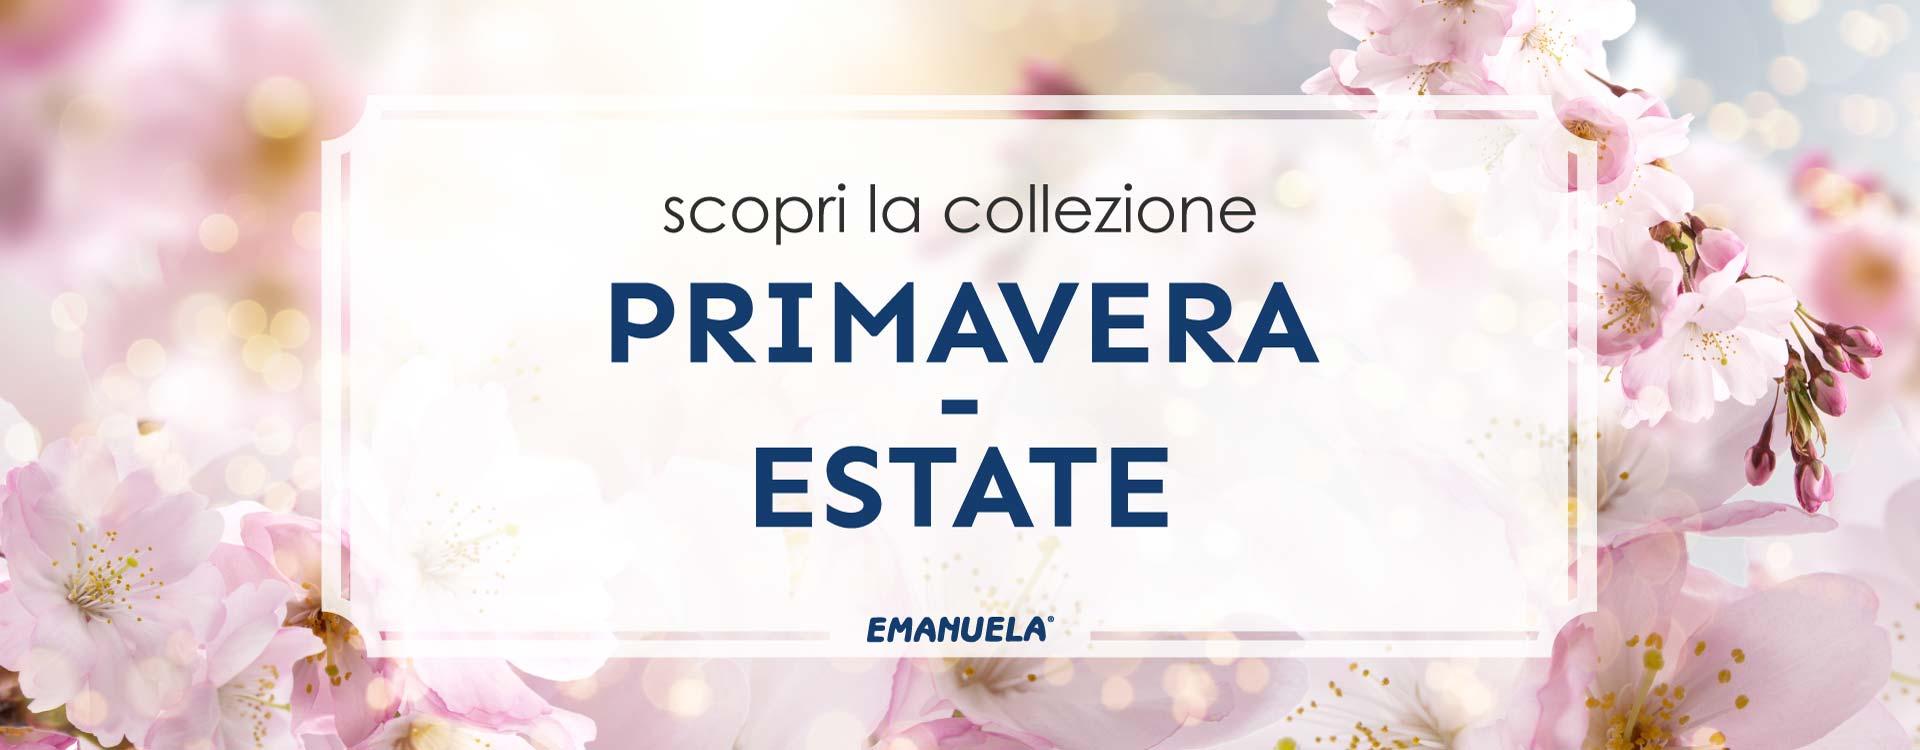 immagine presentazione shop emanuela